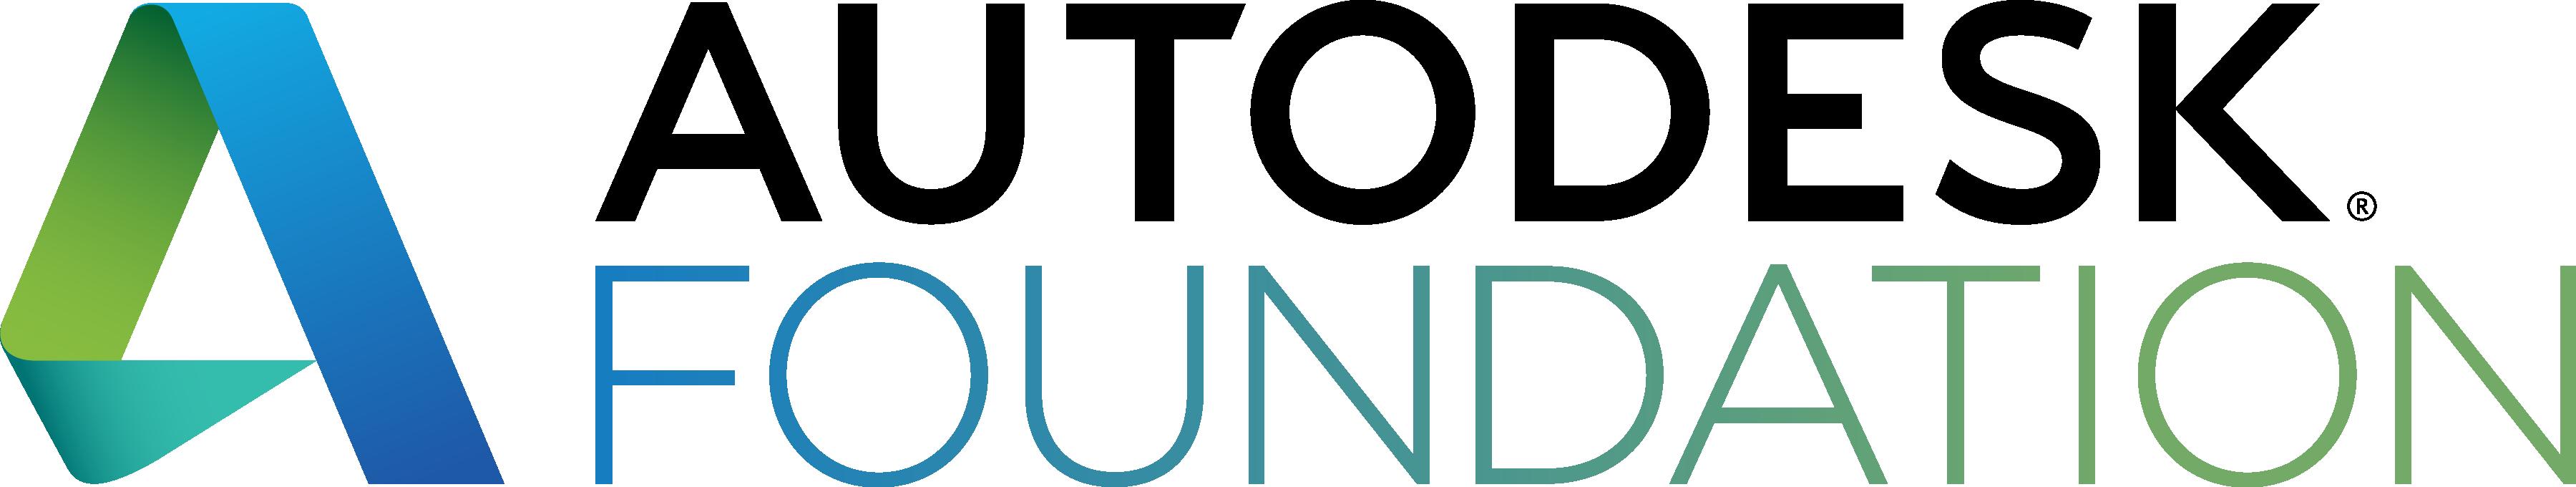 Logo for Autodesk Foundation